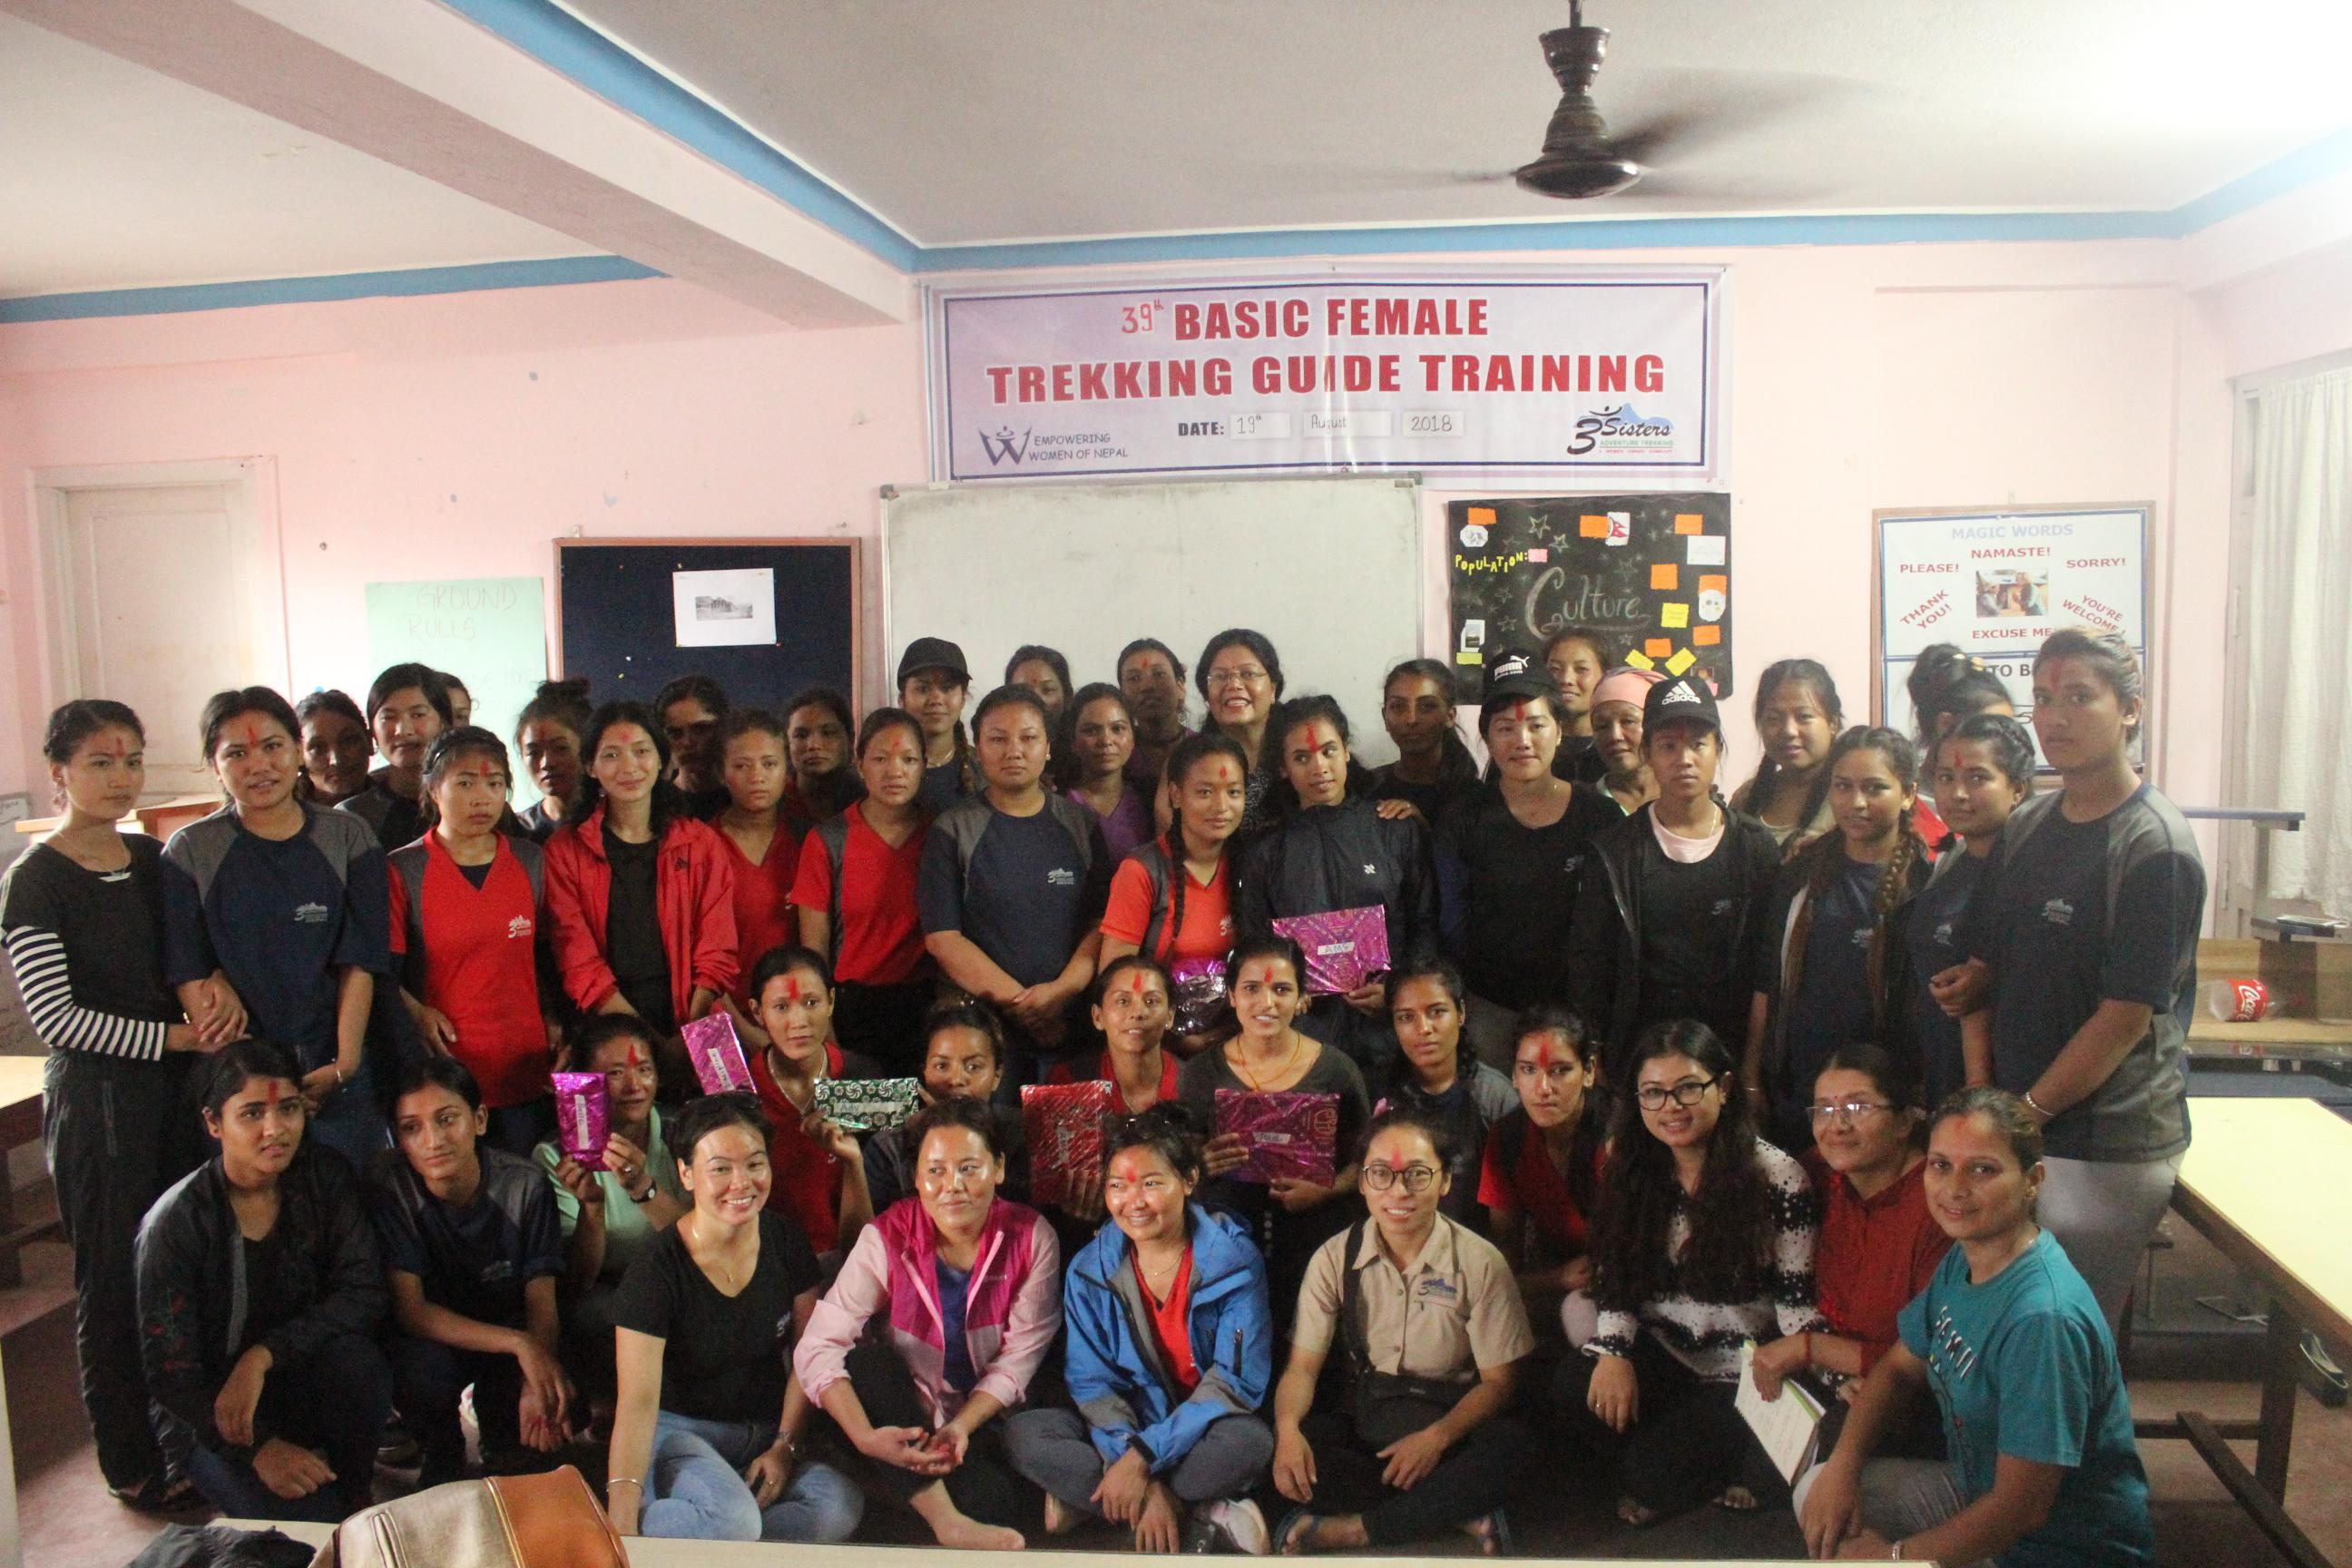 Closing Ceremony of Female Trekking Guide Training 2018